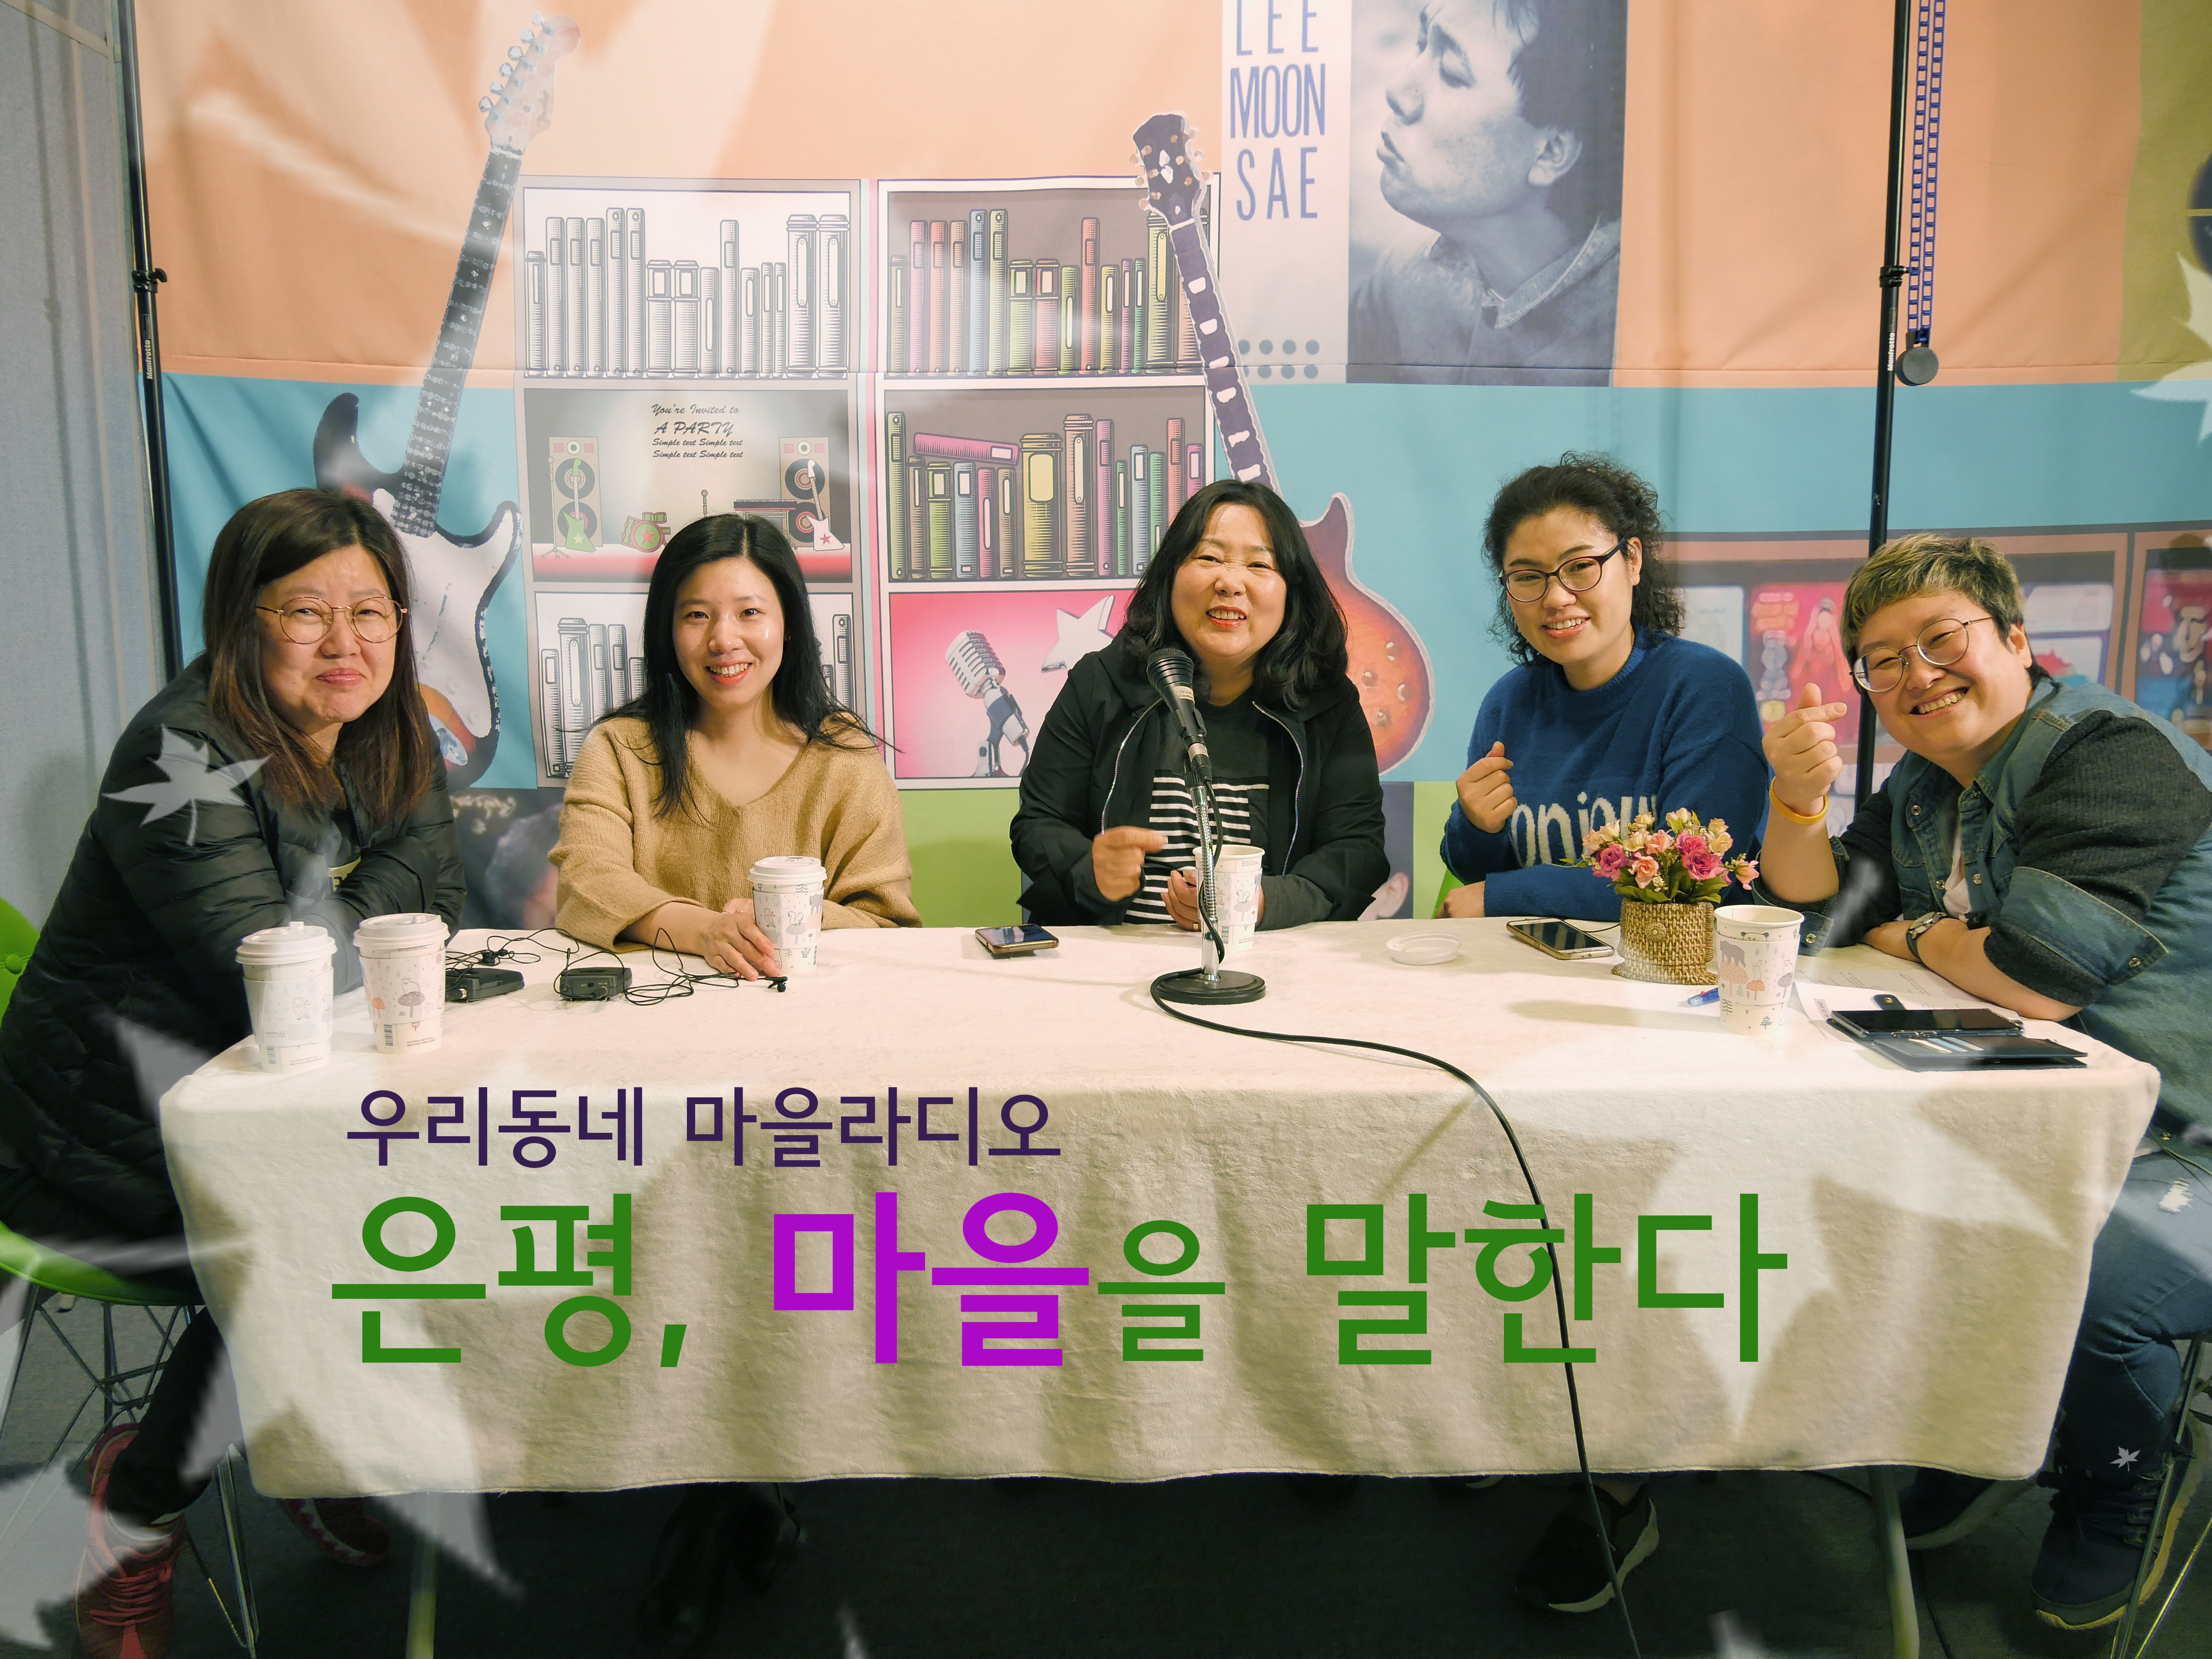 http://58.225.10.93/Media/EBN/EBNP0022/김미영_마을을말한다.jpg